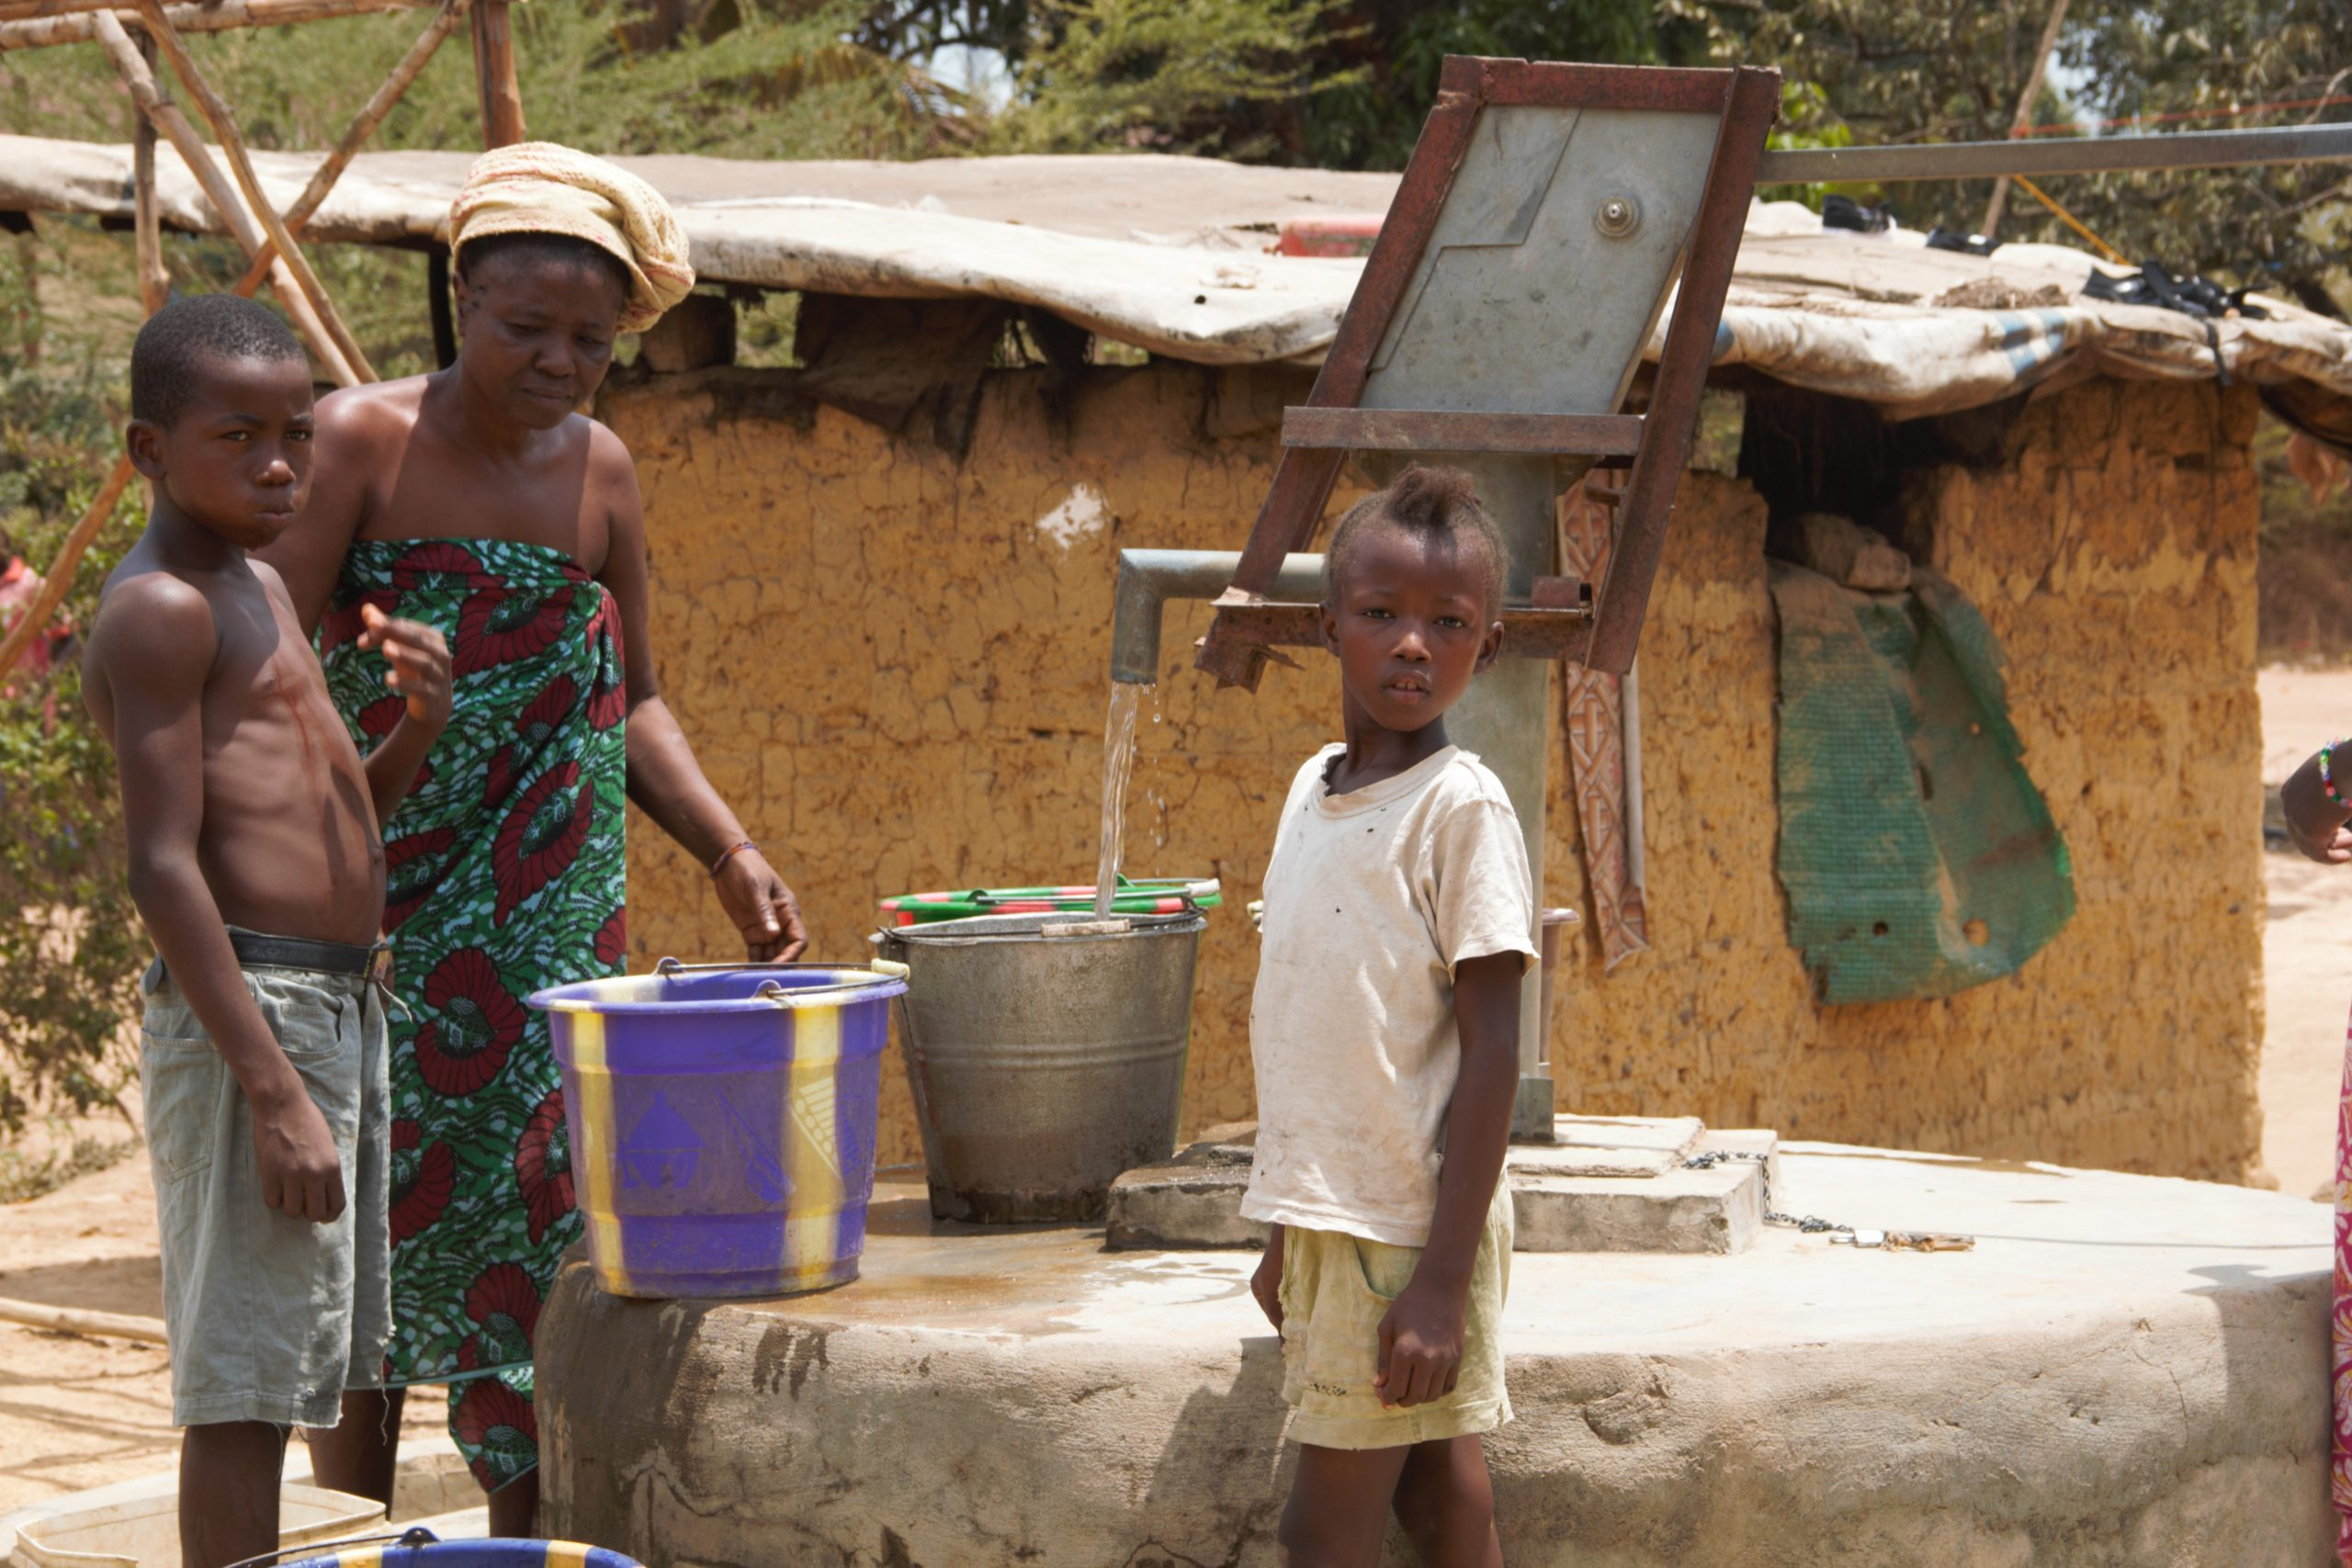 Handpump use in Sierra Leone